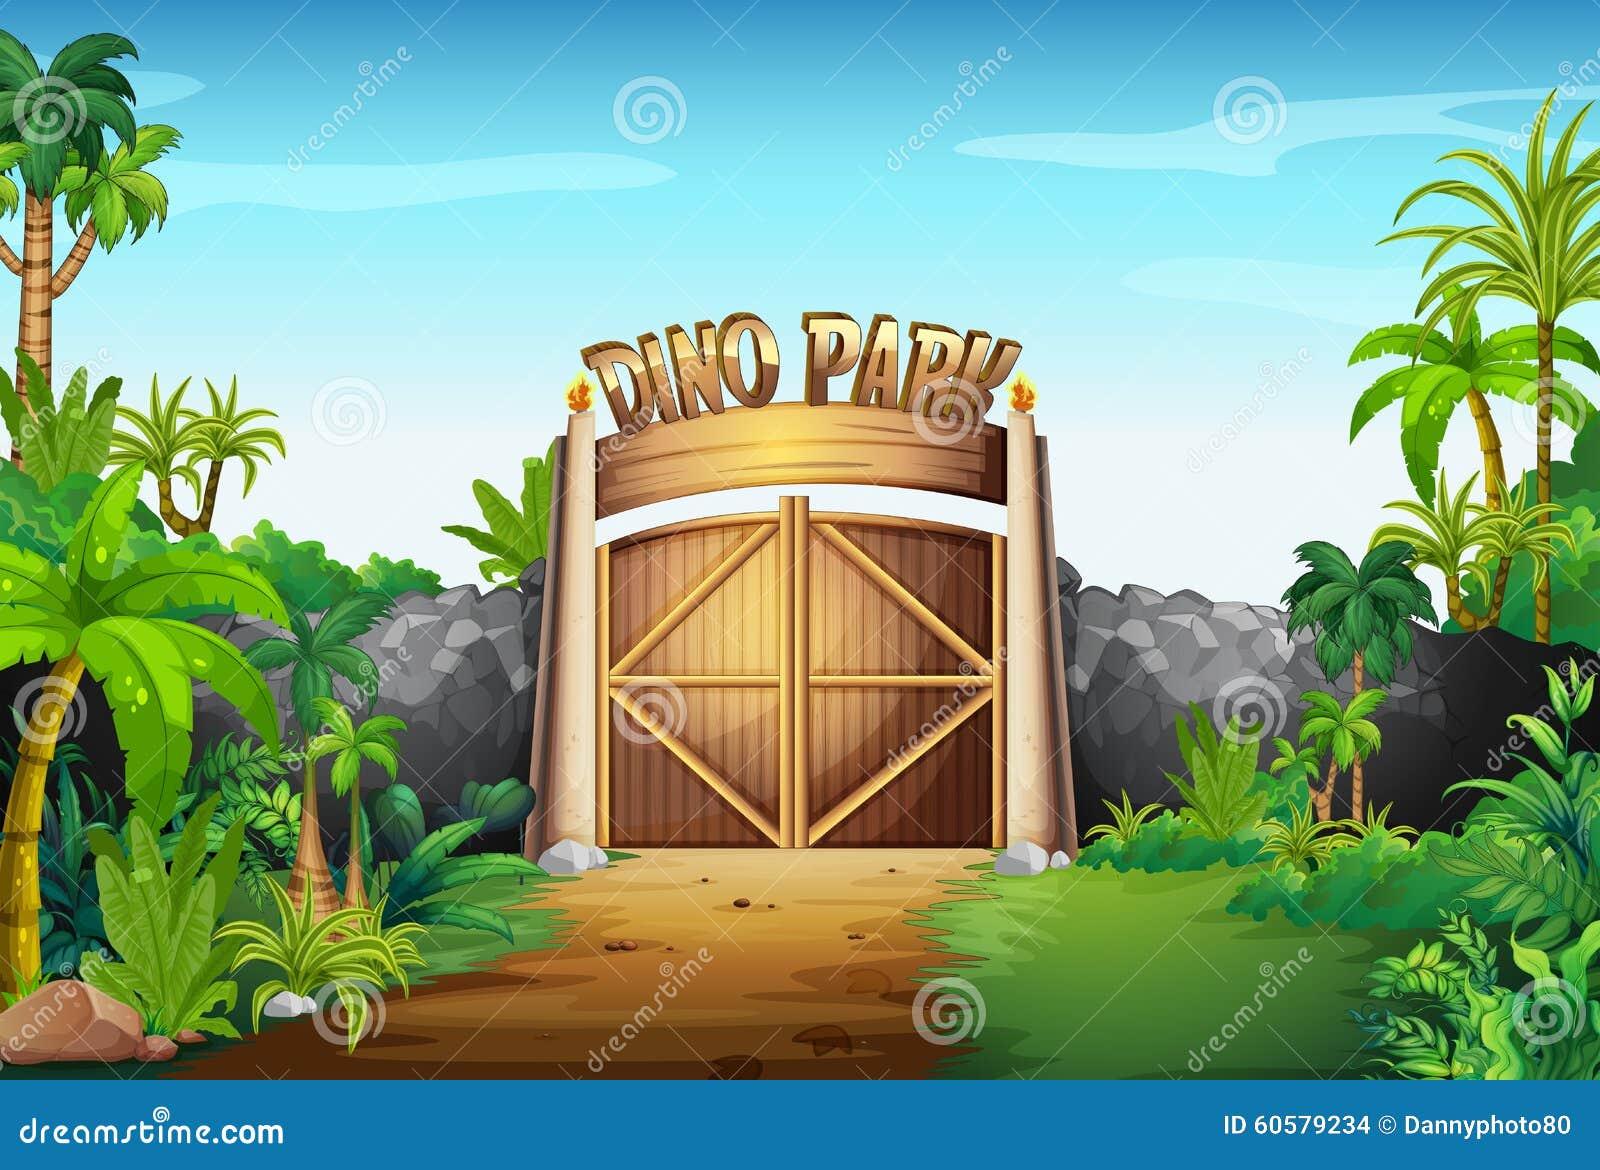 La porte du parc de dino illustration stock image 60579234 for La porte in time zone